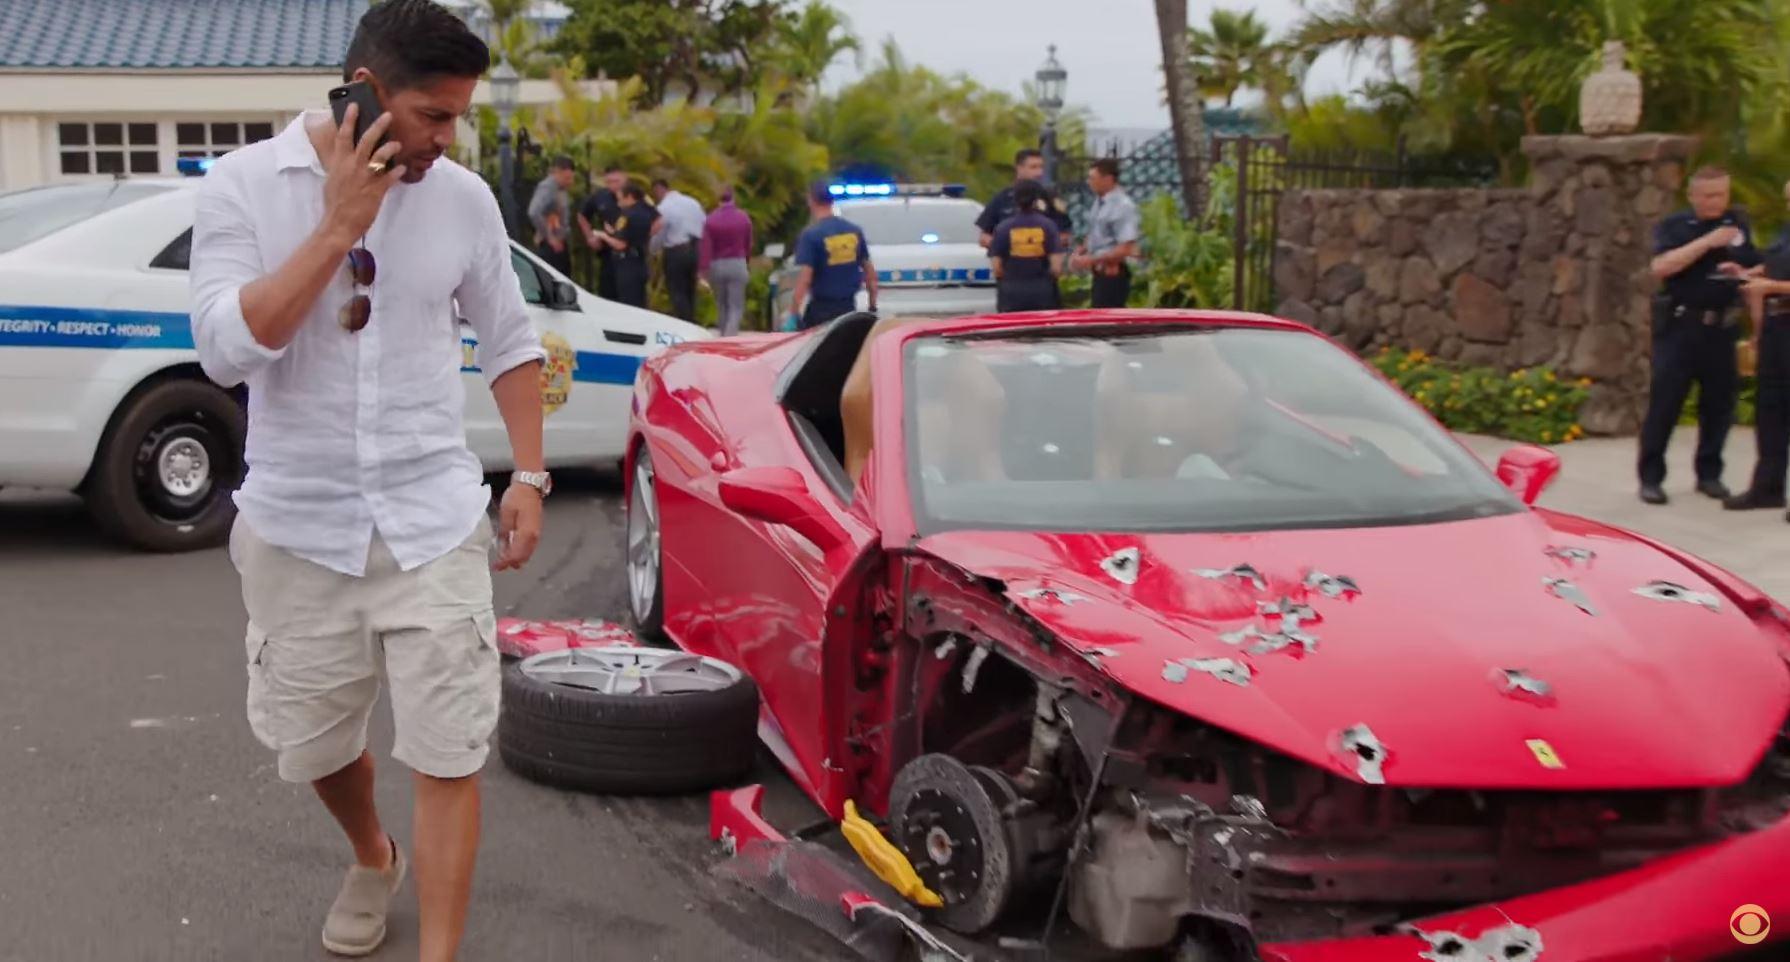 Ferrari 488 Spider after being shot at